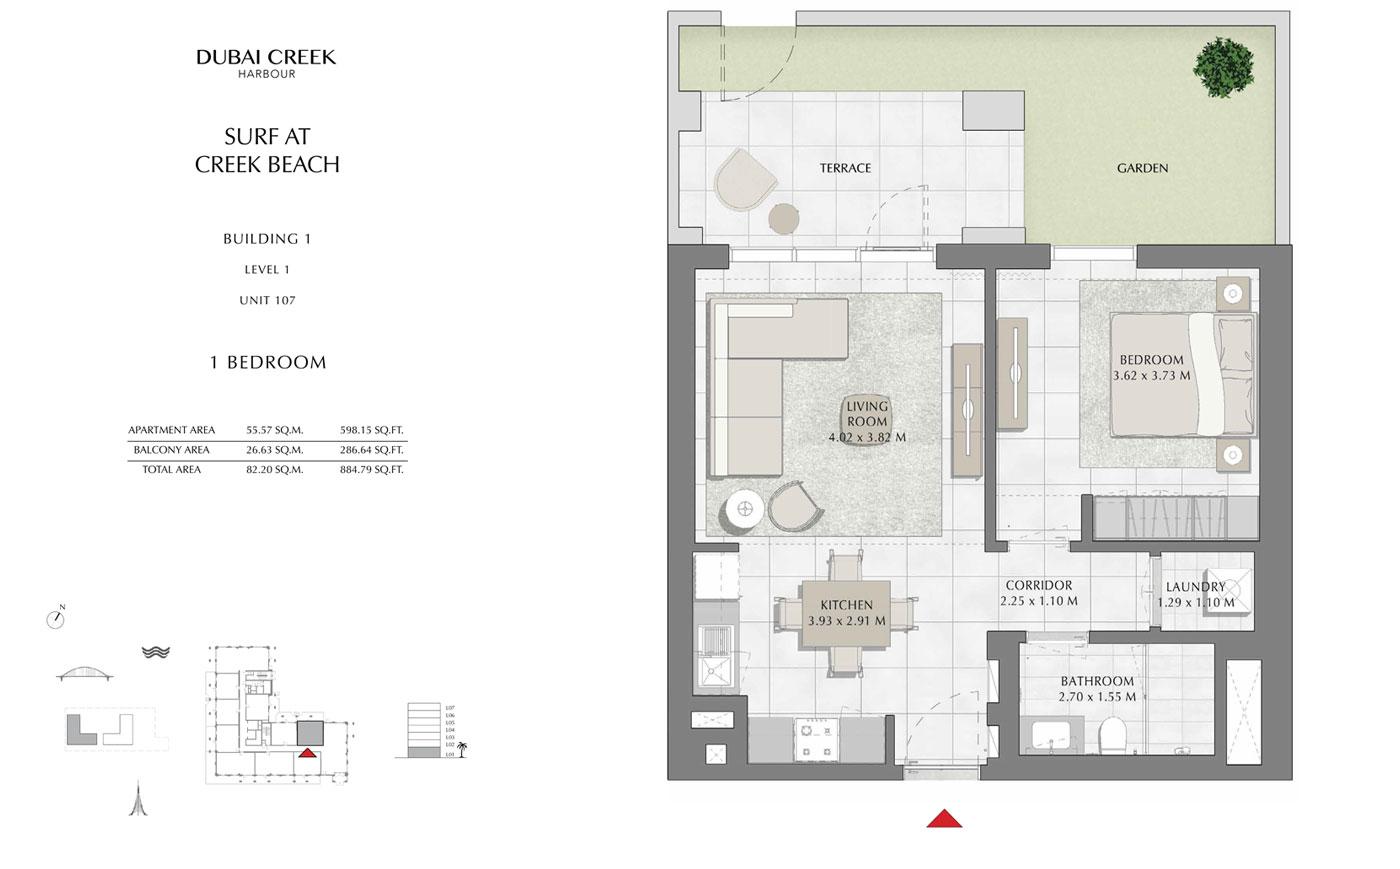 Building-1-1-Bedroom,-Level-1,-Unit-107,-Size-884.79-sq-ft